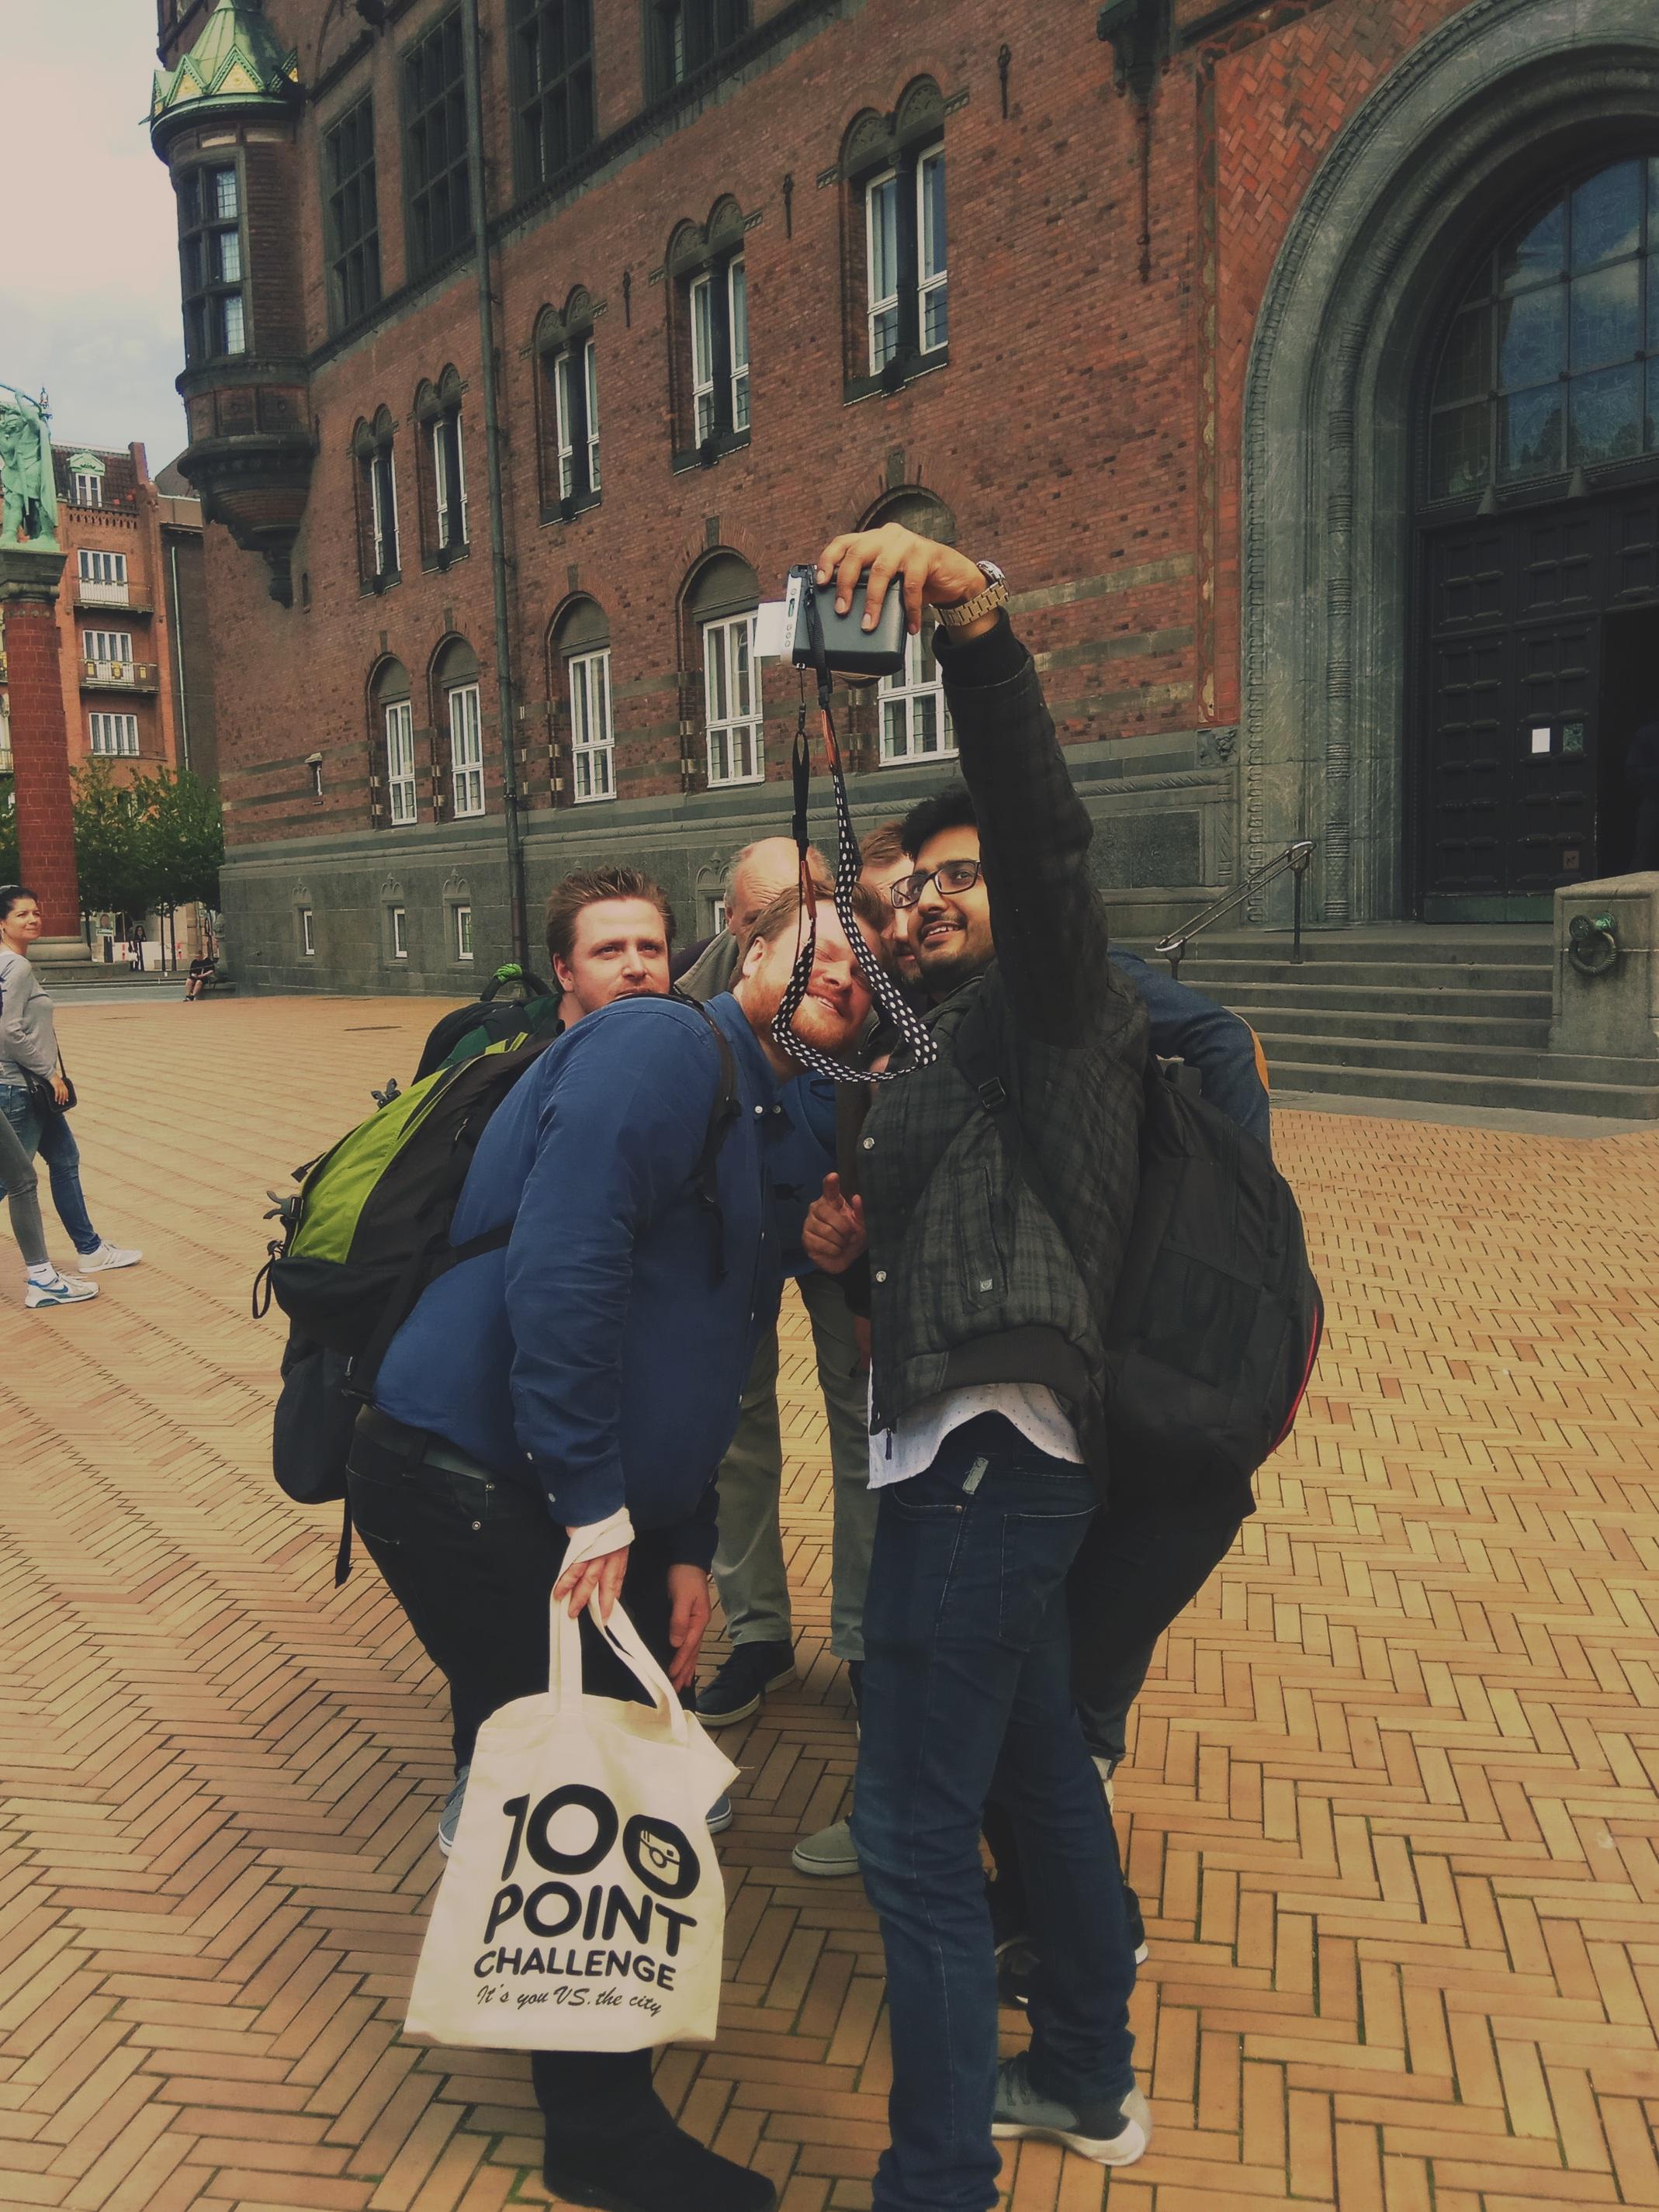 IMG_20190523_145309 - 100 Point Challenge Copenhagen.jpg